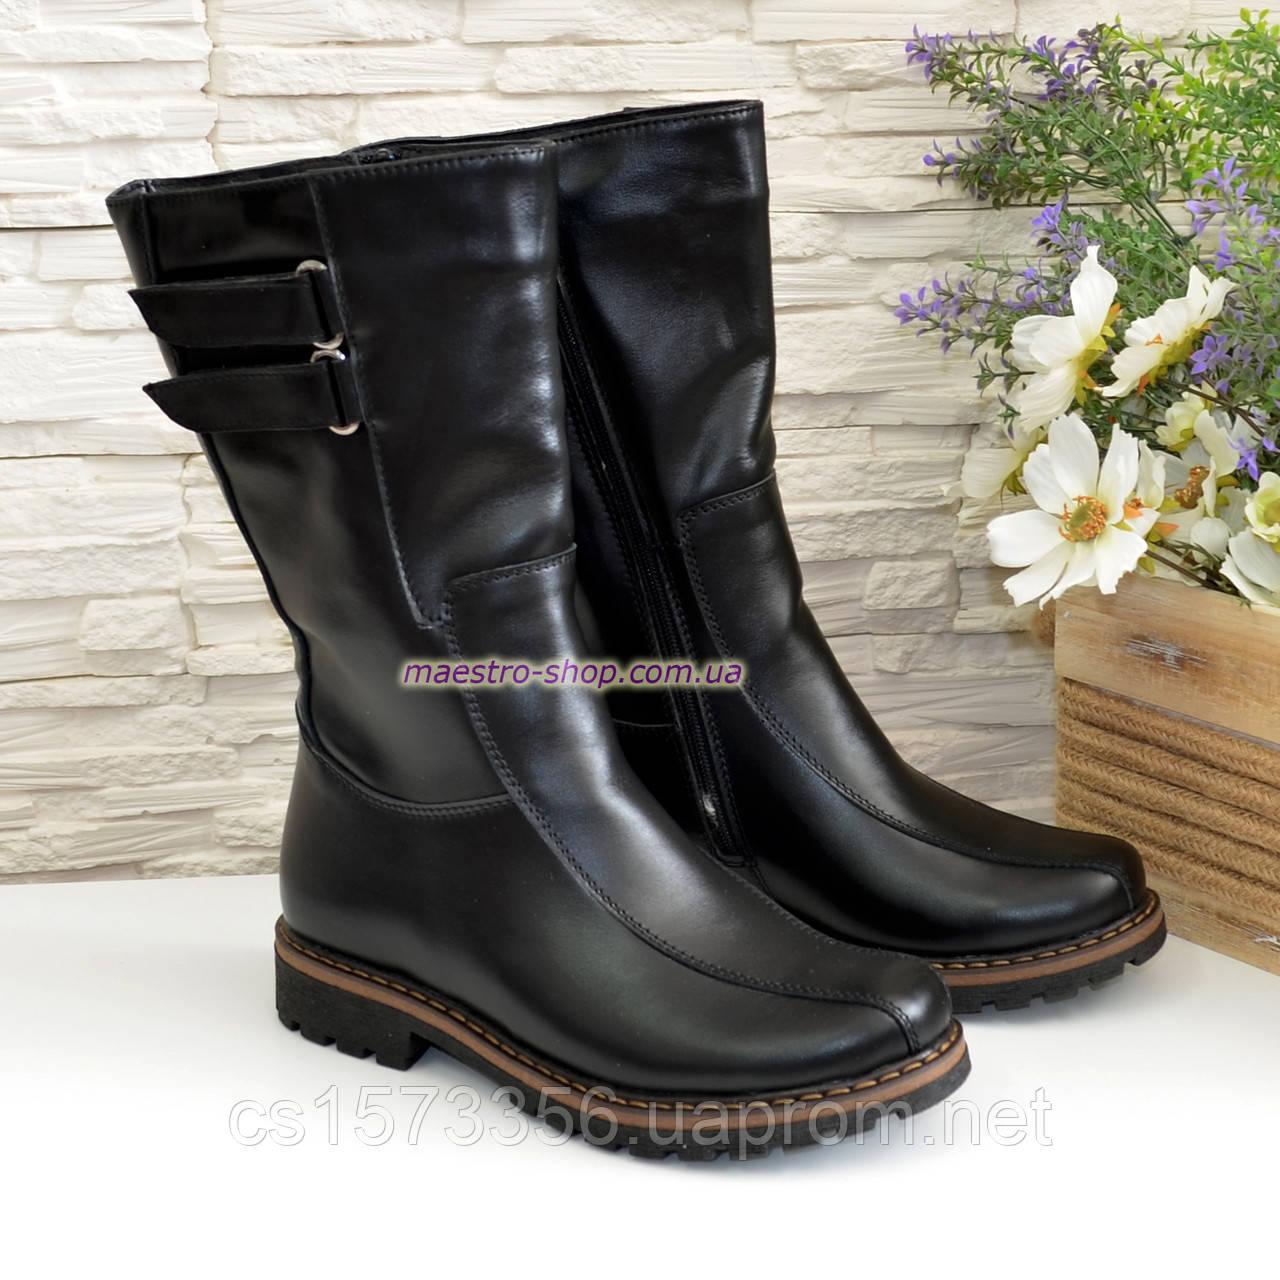 Кожаные женские ботинки оптом